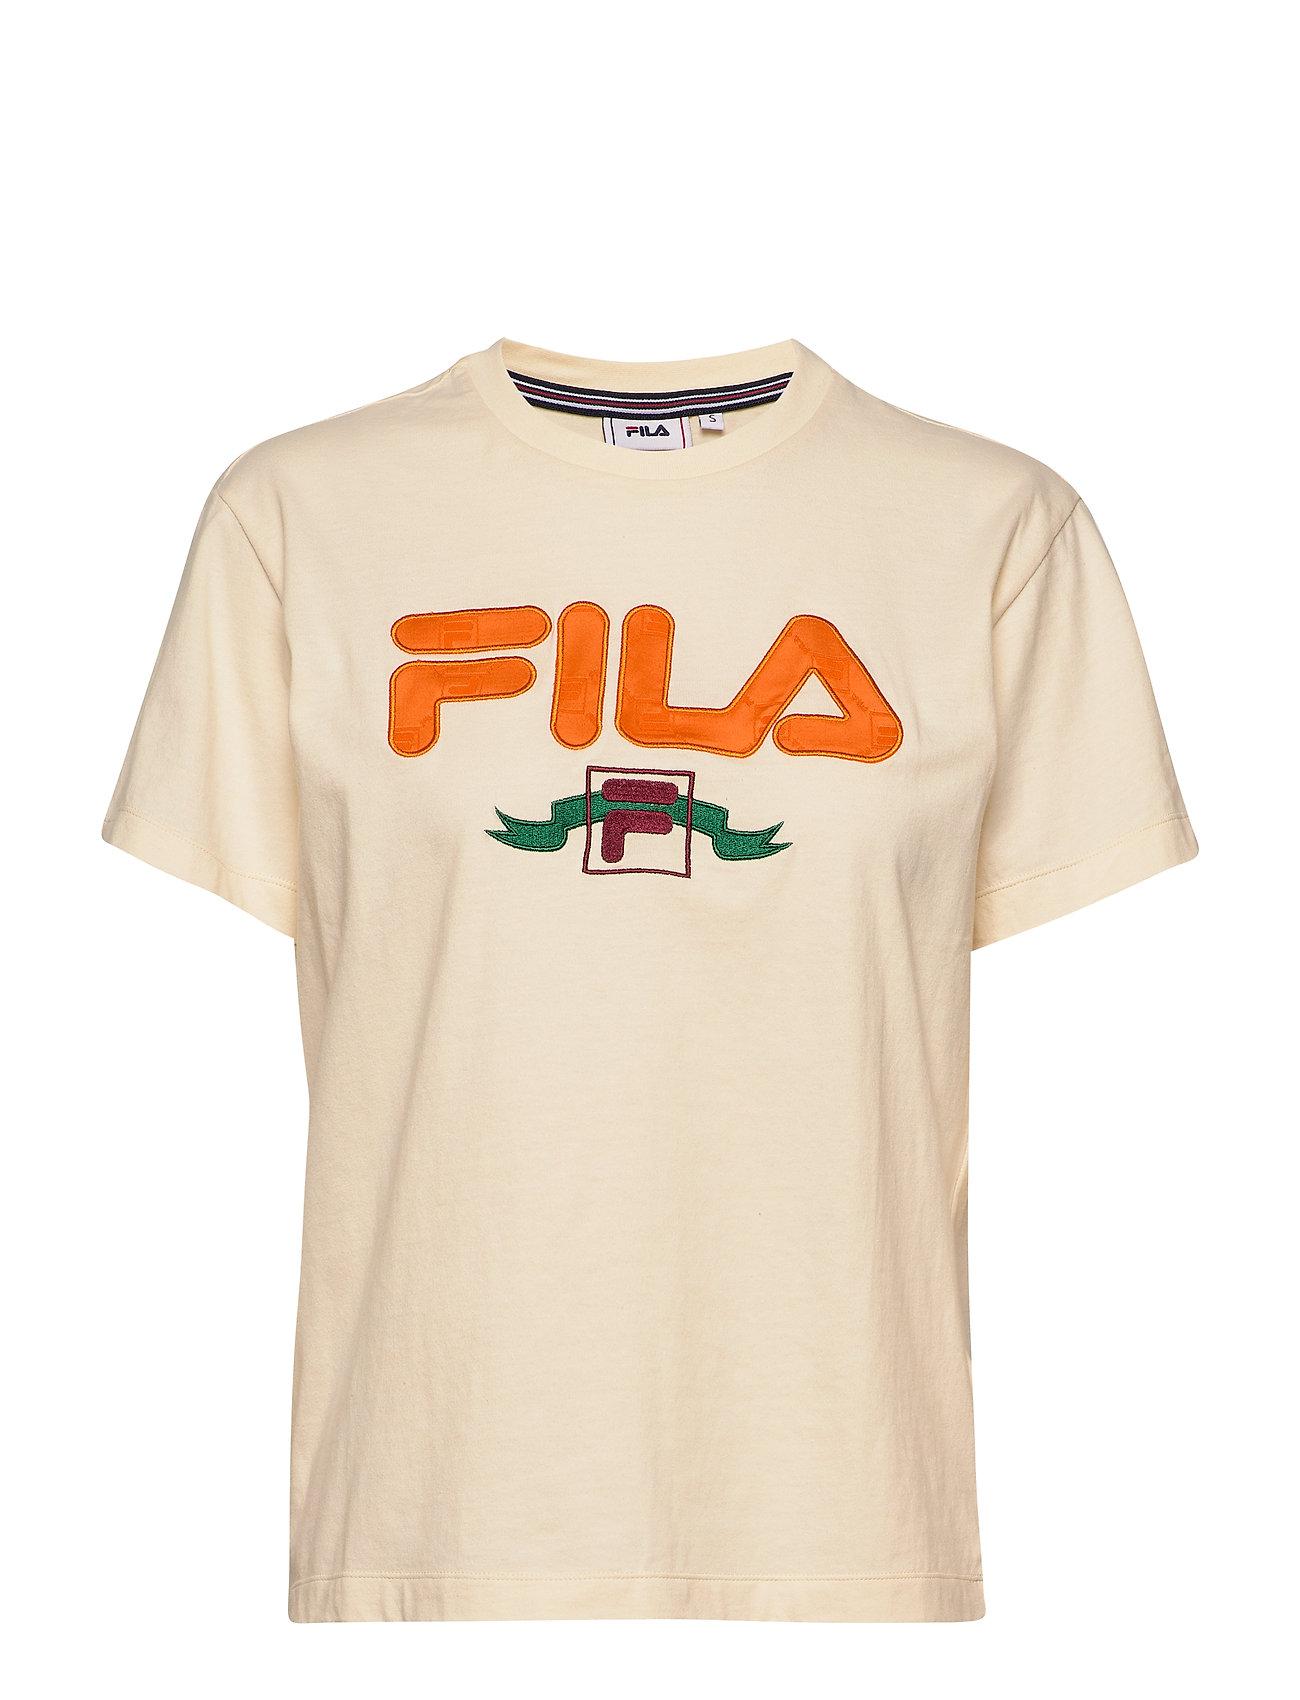 Image of Women Halona Tee T-shirt Top Creme FILA (3362841527)